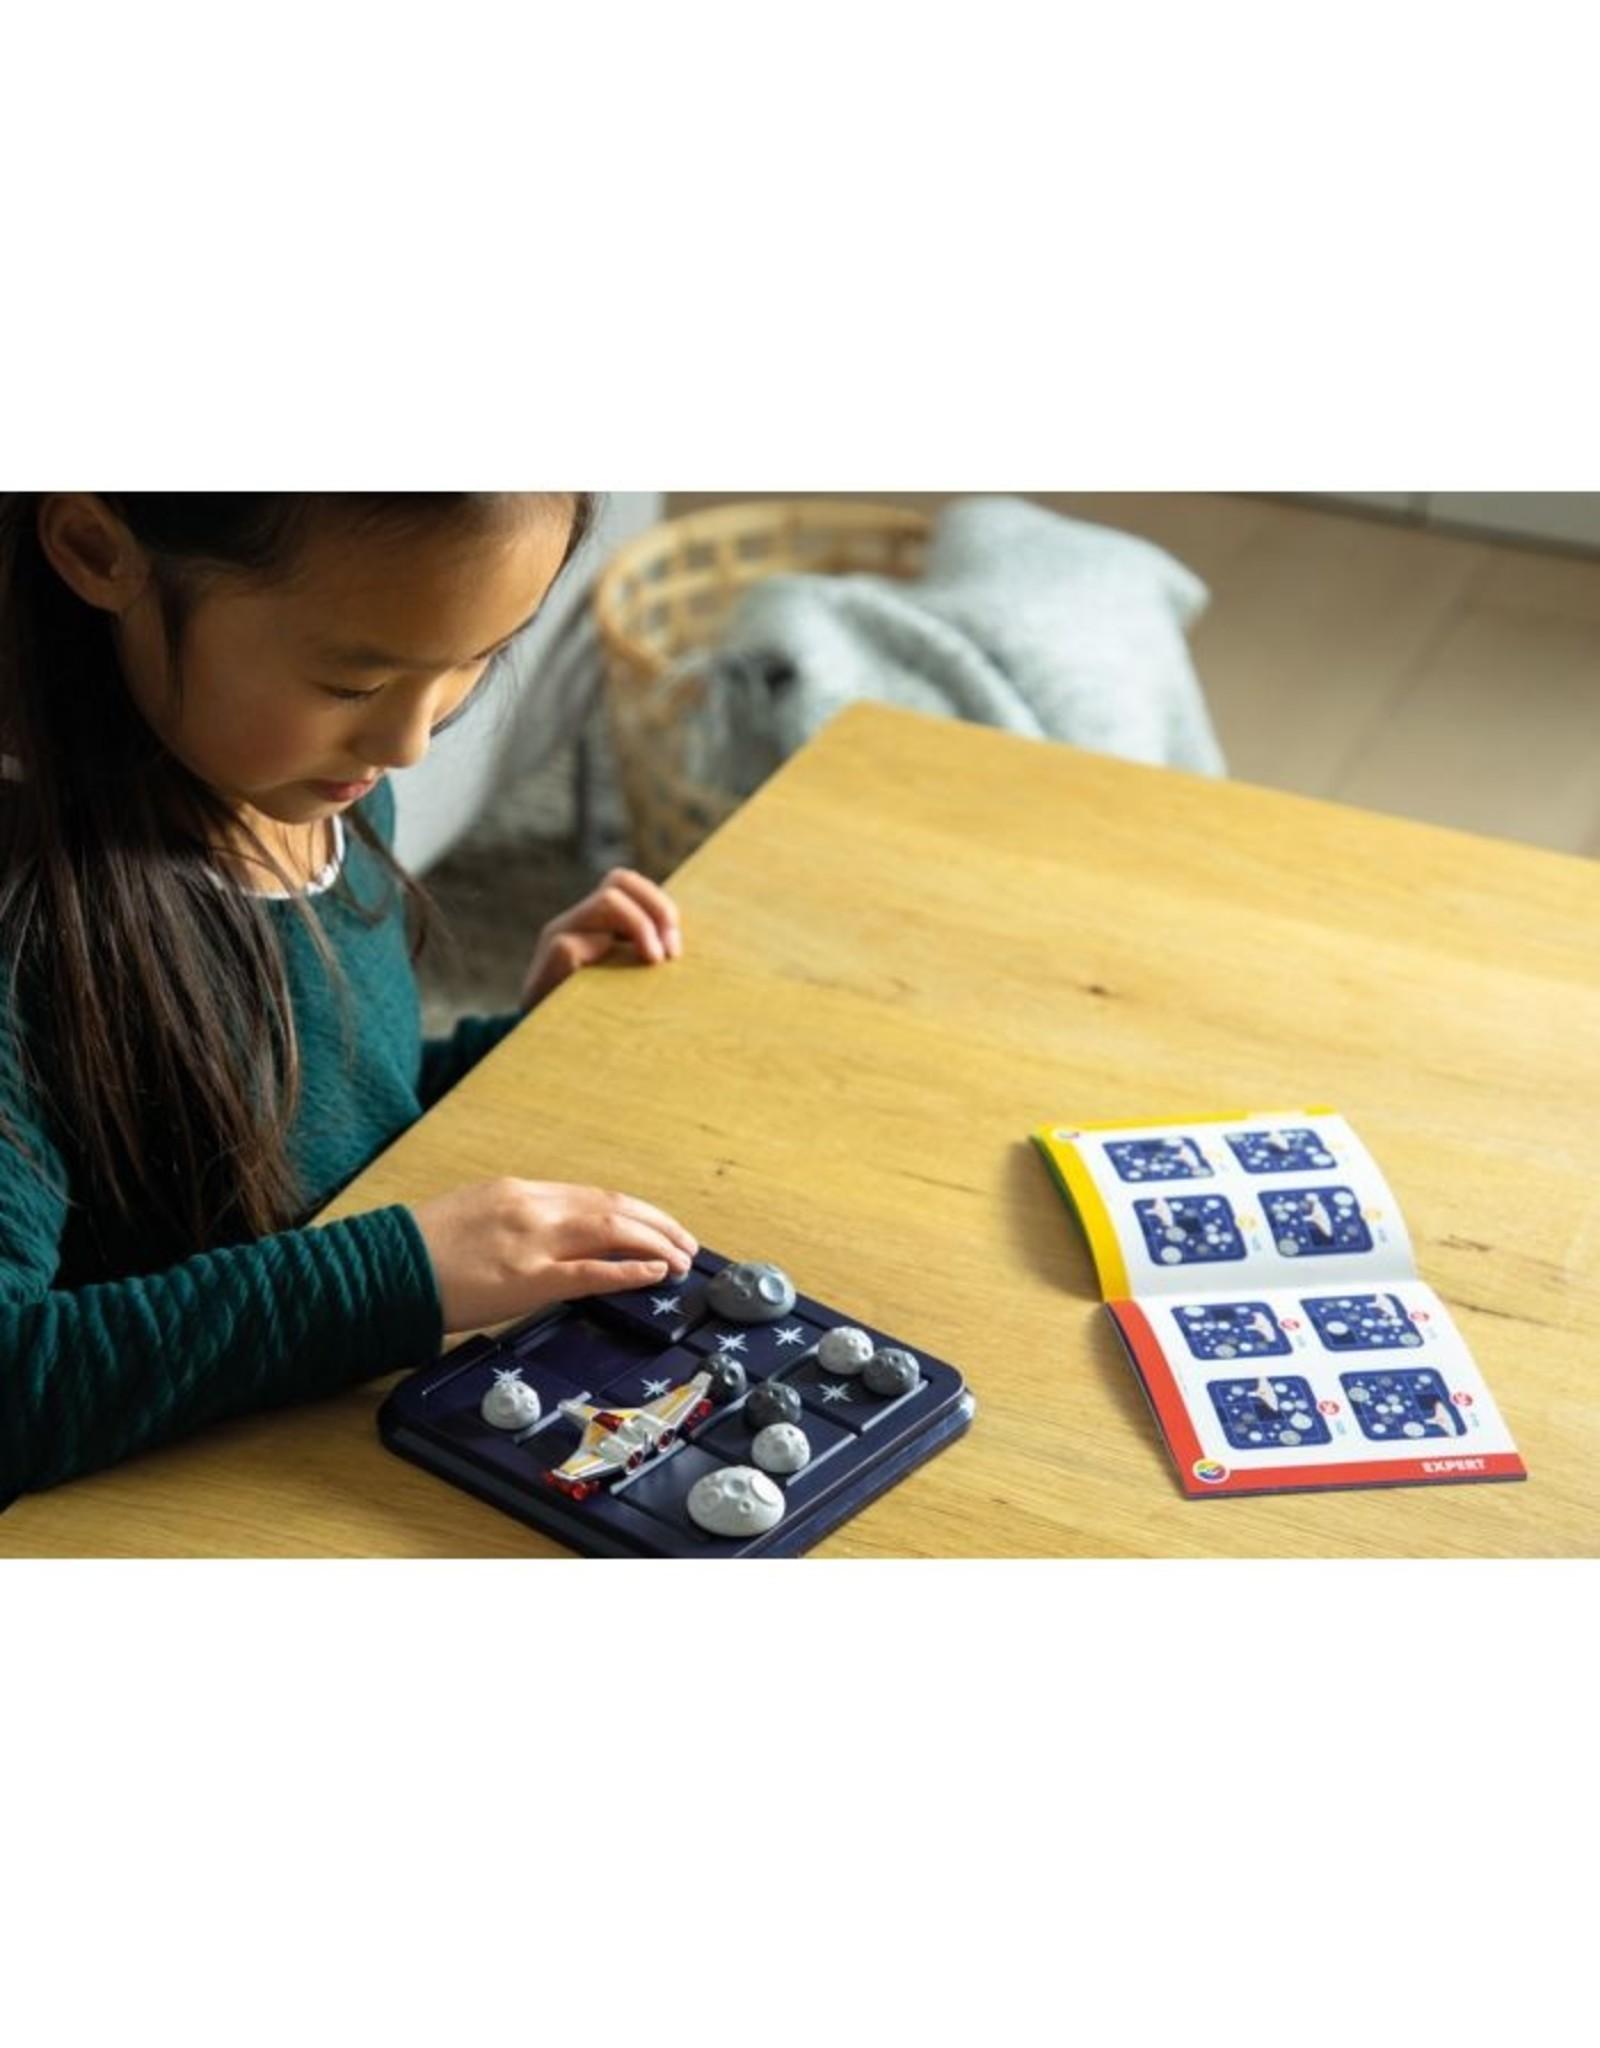 Smart Toys & Games Asteroid Escape